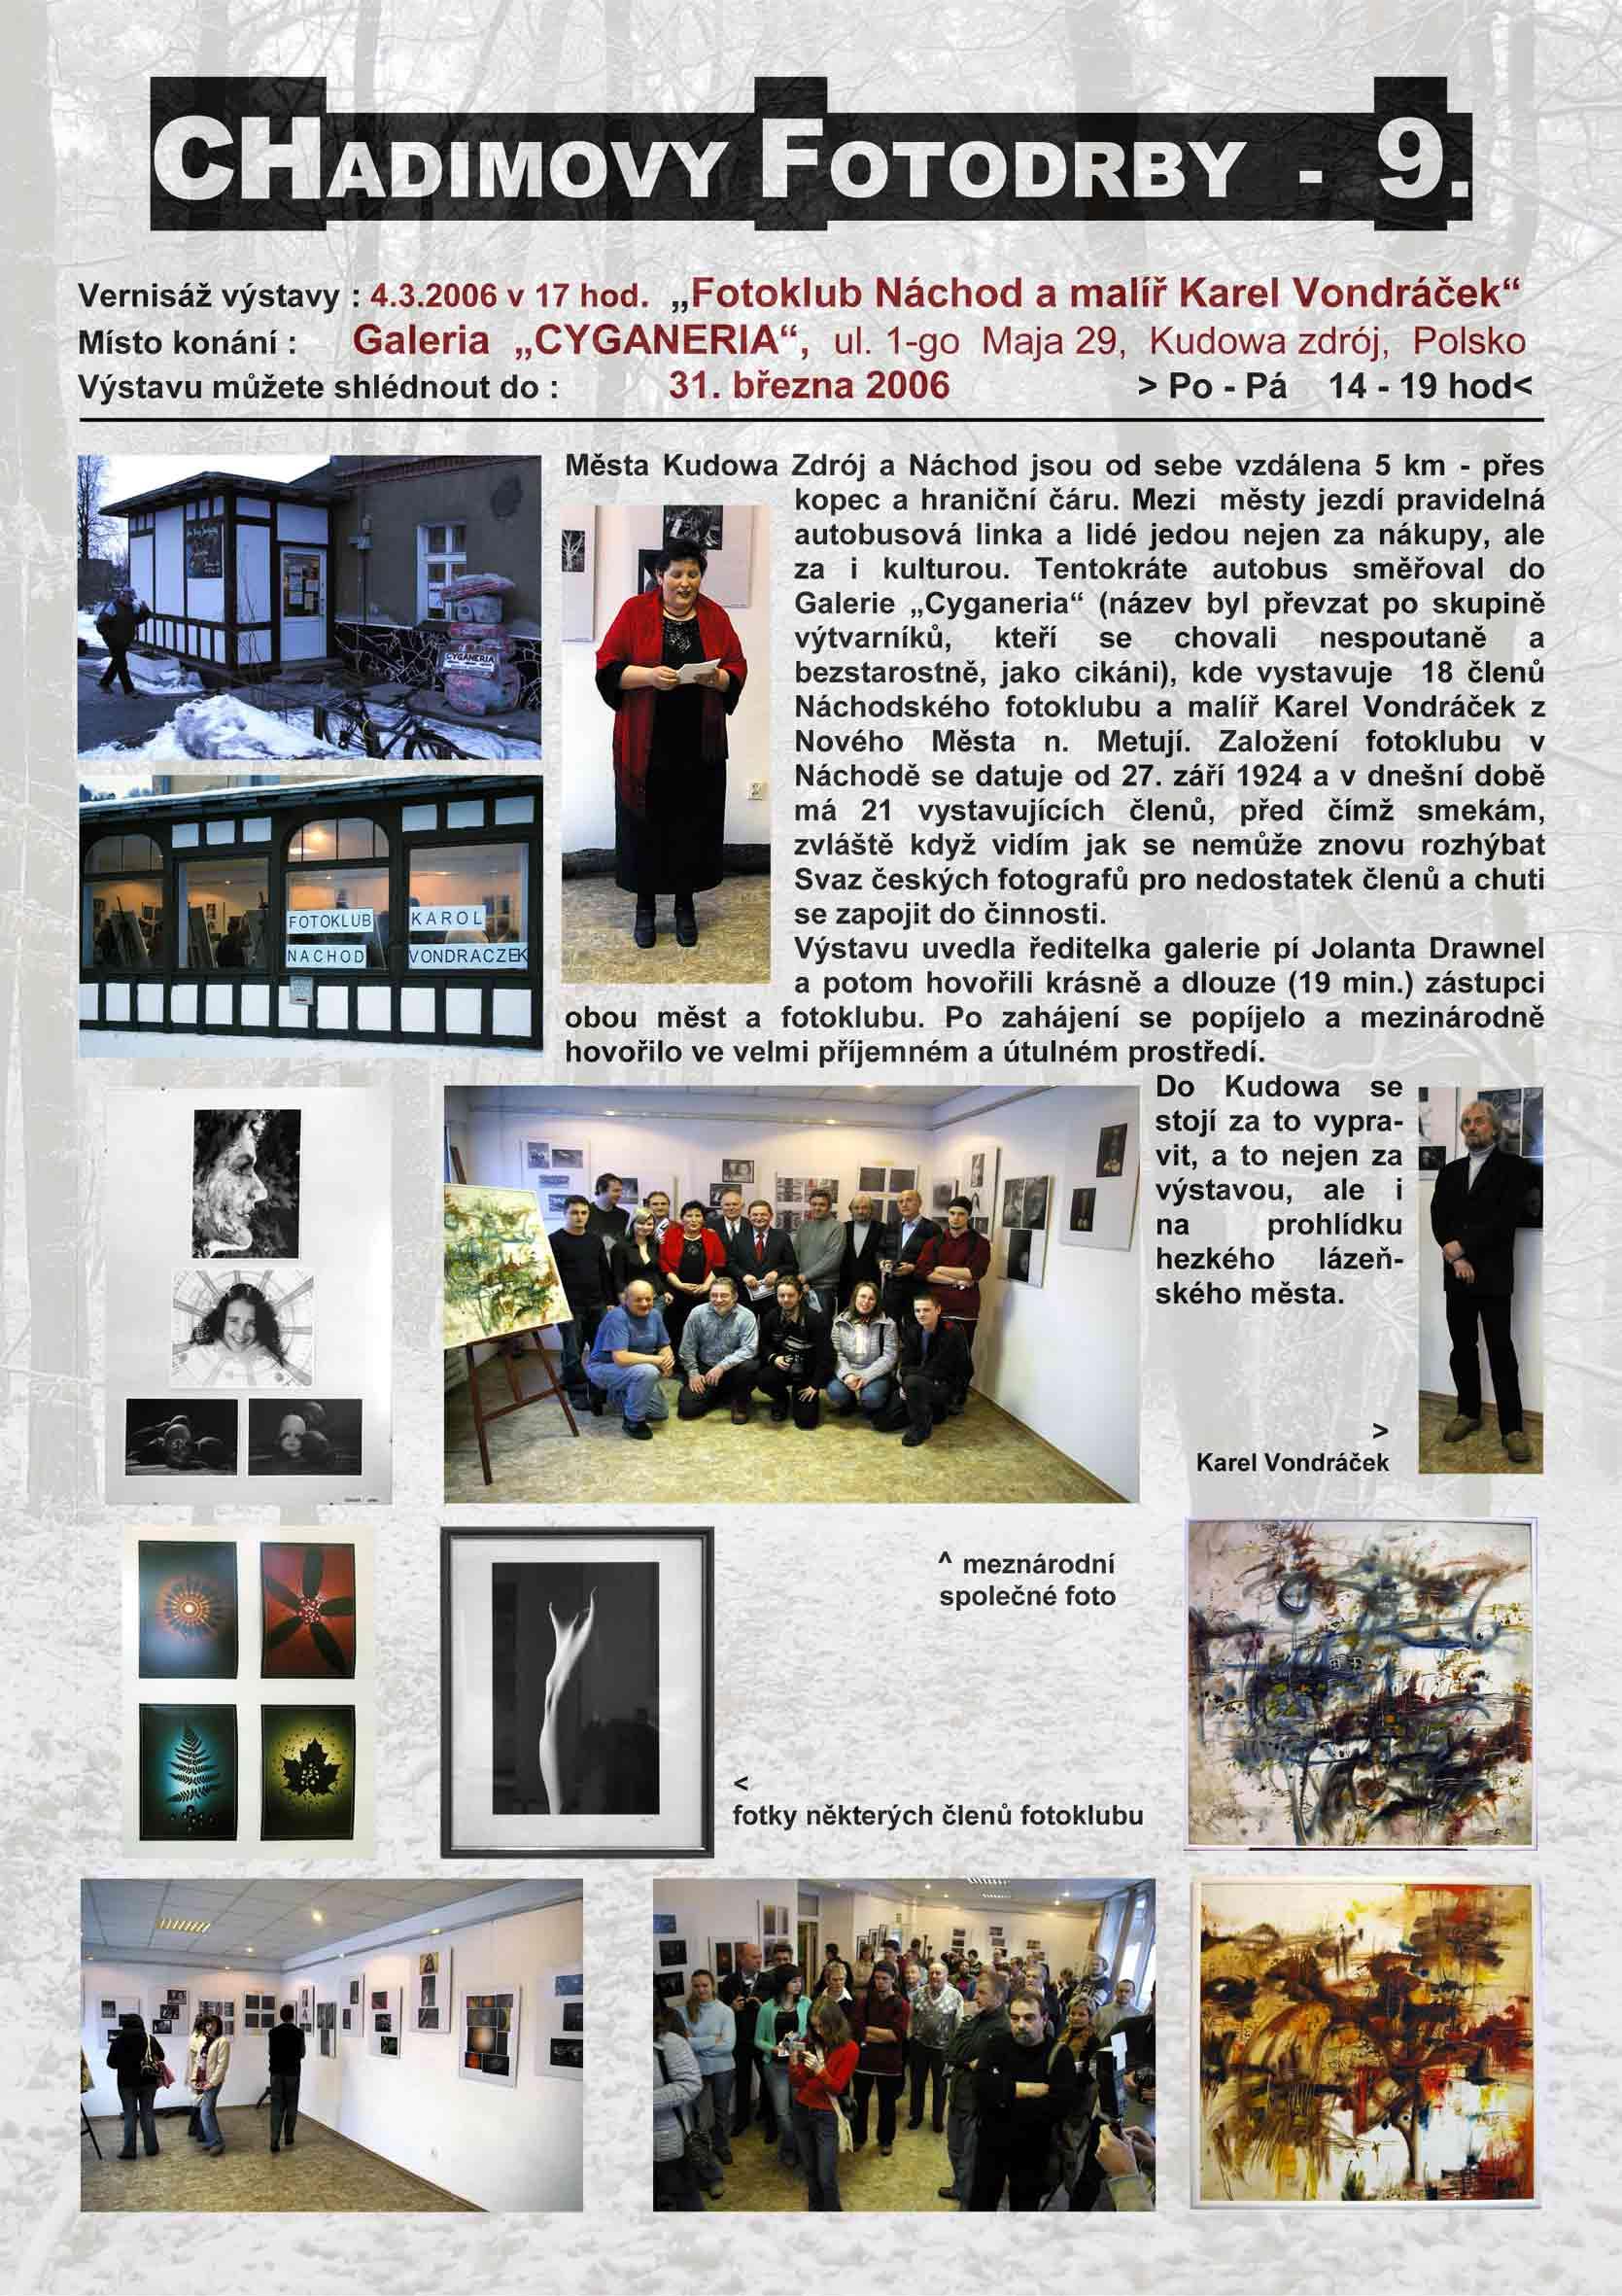 Fotorevue 9 – Fotoklub Náchod a malíř Karel Vondráček